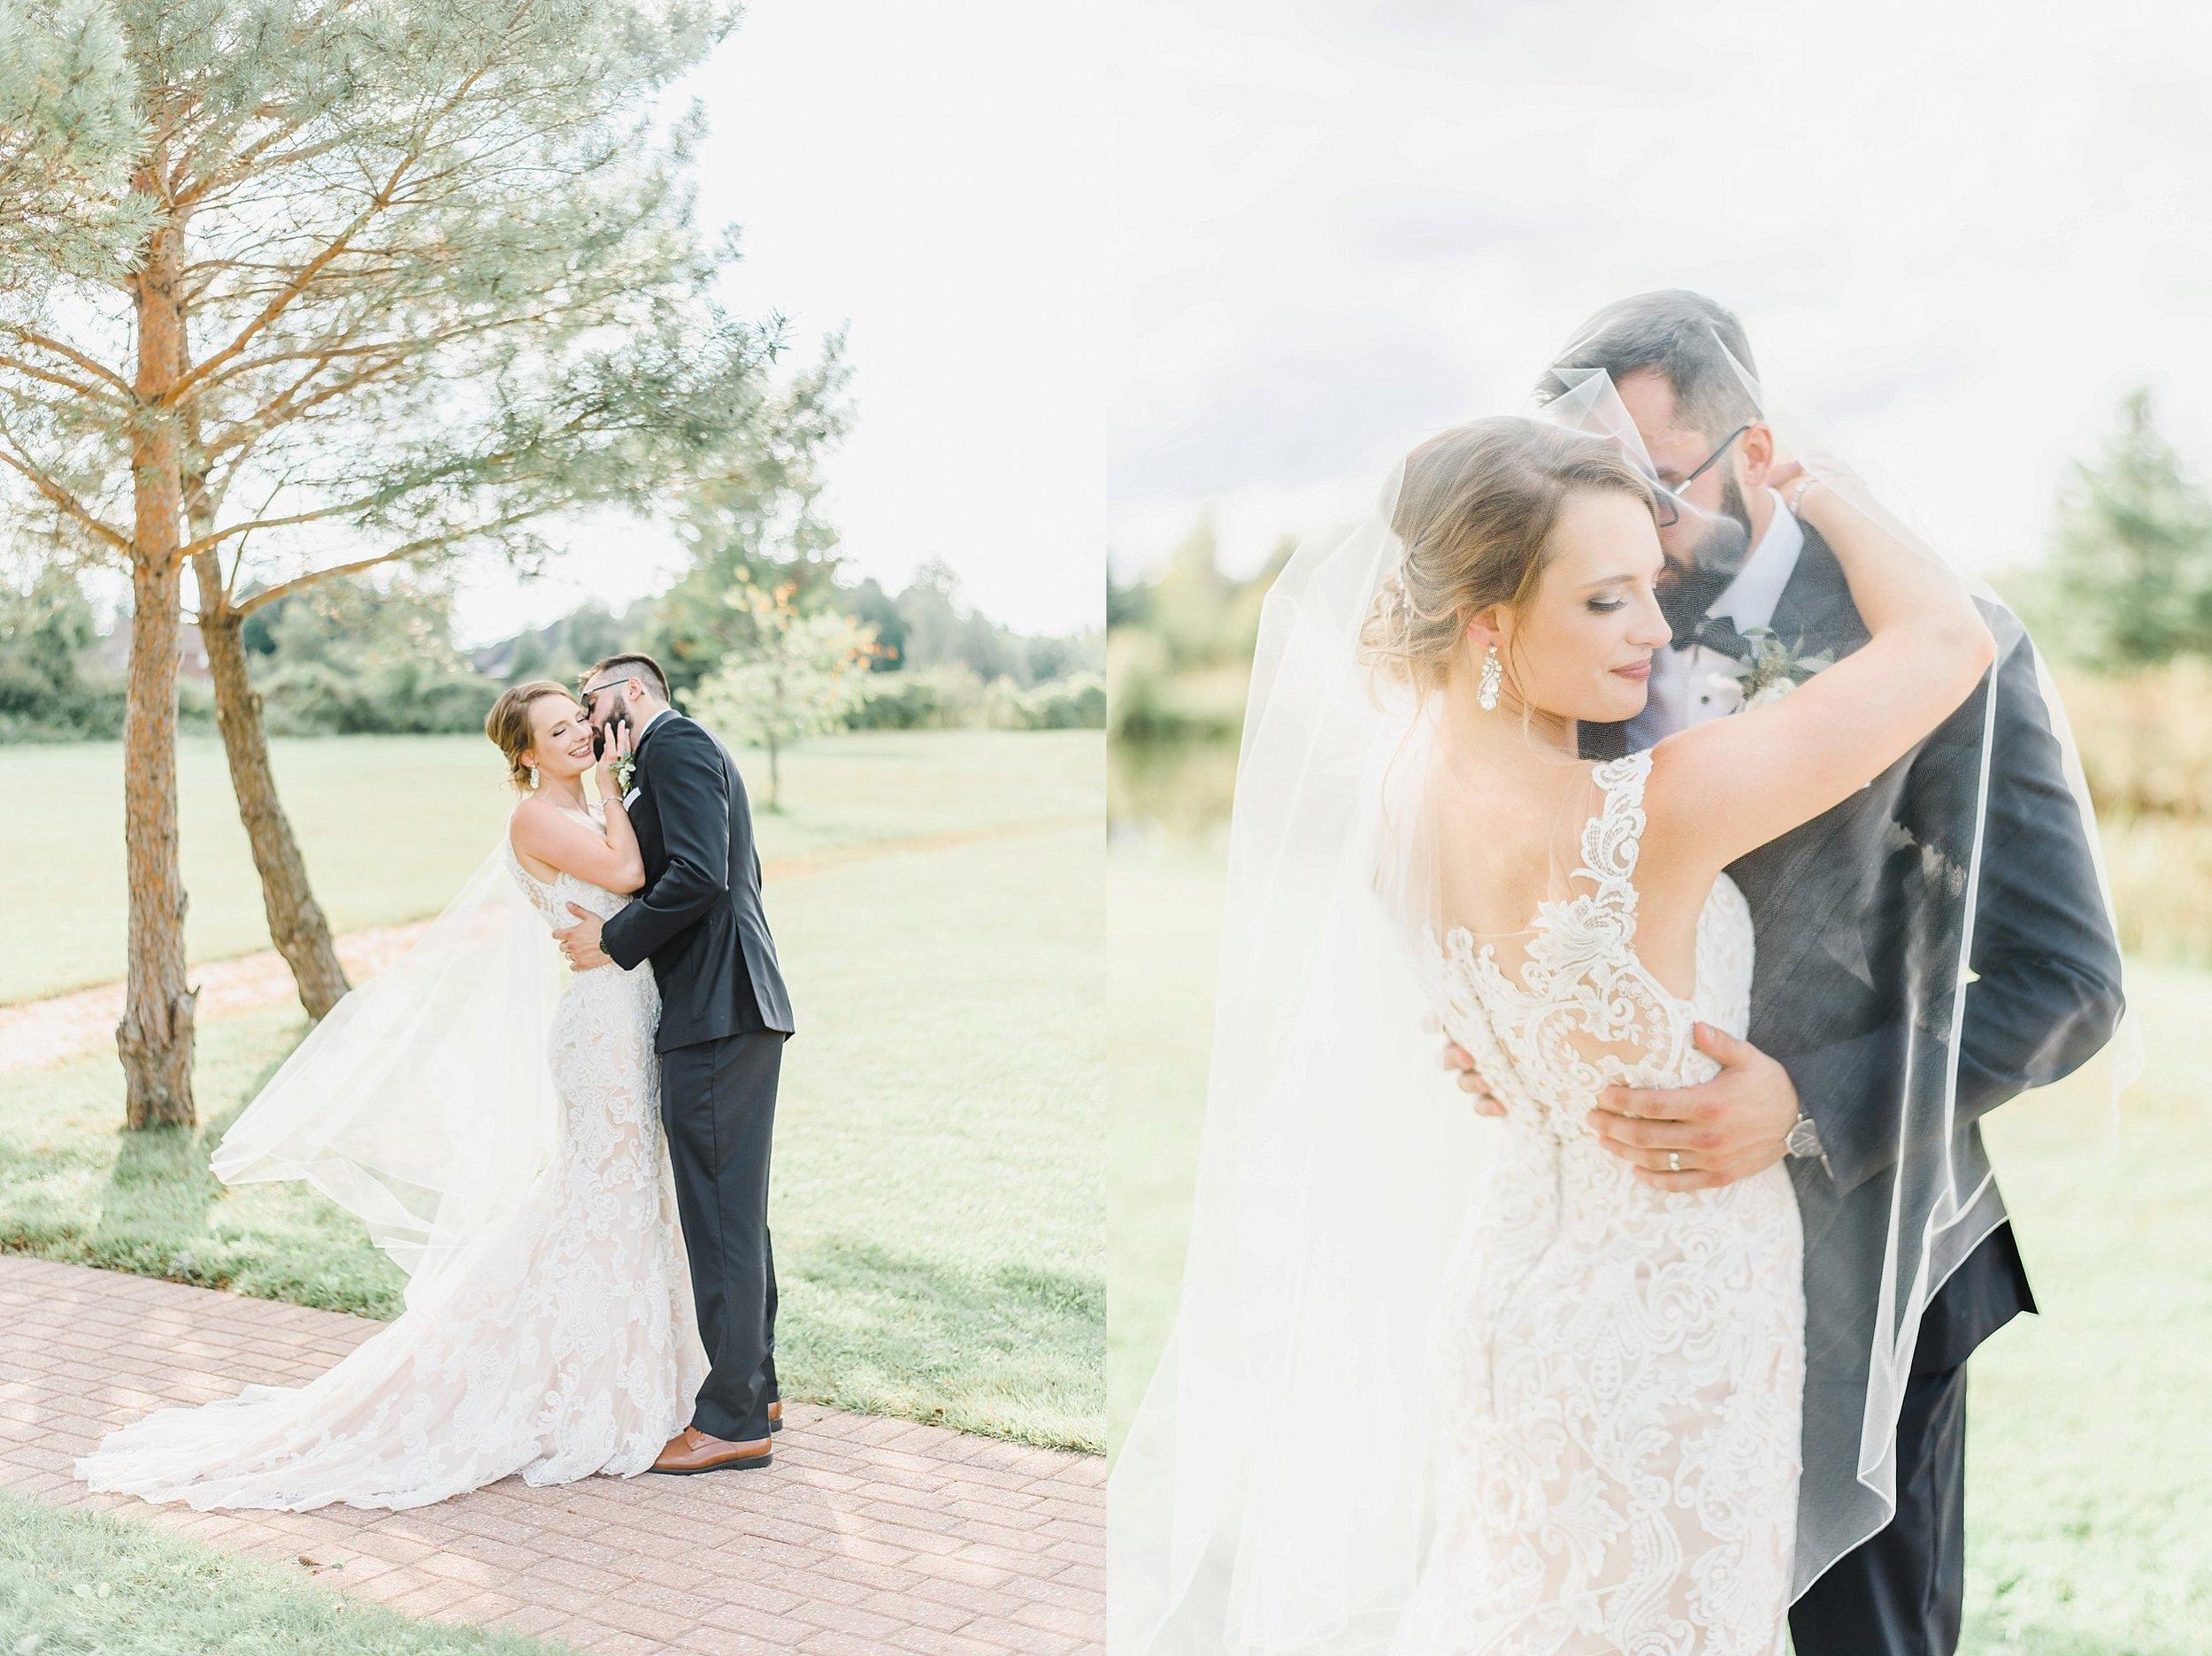 light airy indie fine art ottawa wedding photographer | Ali and Batoul Photography_1312.jpg